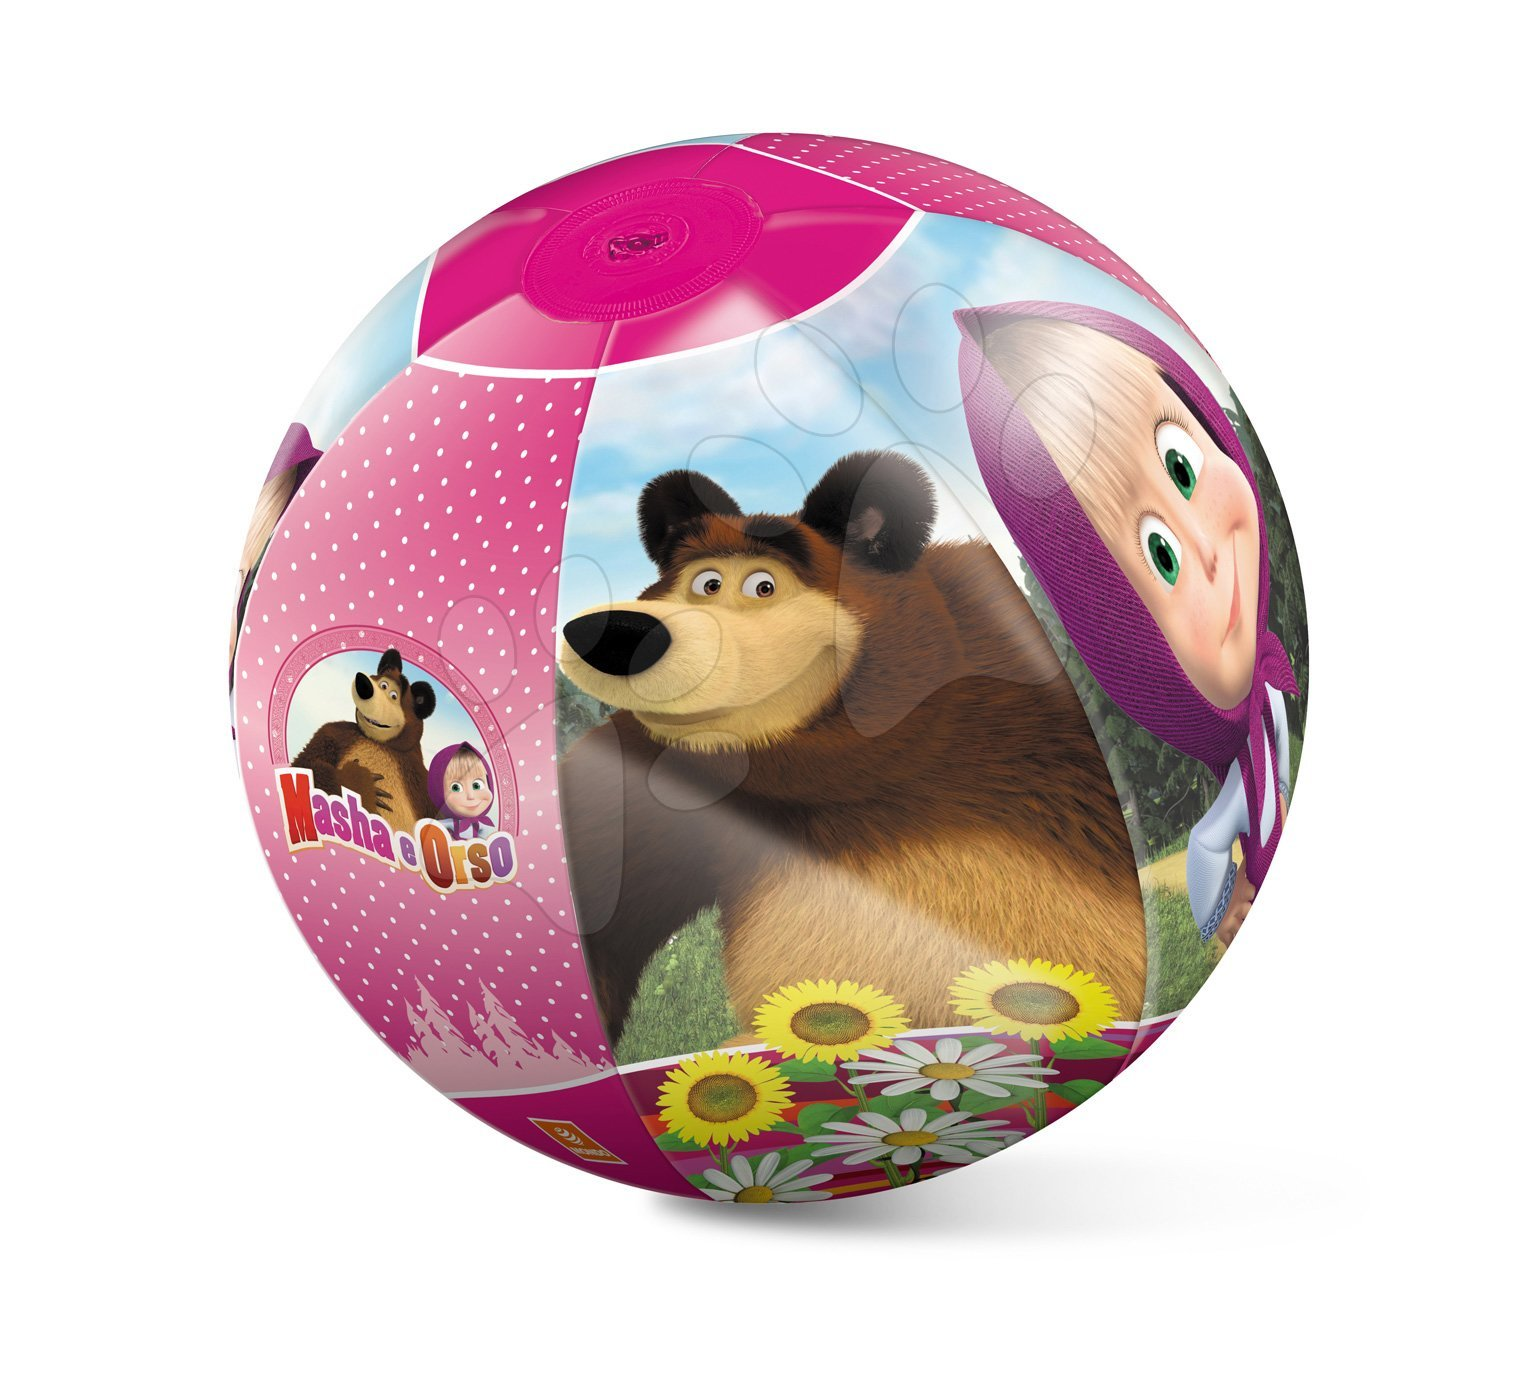 Nafukovací míč na pláž Máša a Medvěd Mondo 50 cm